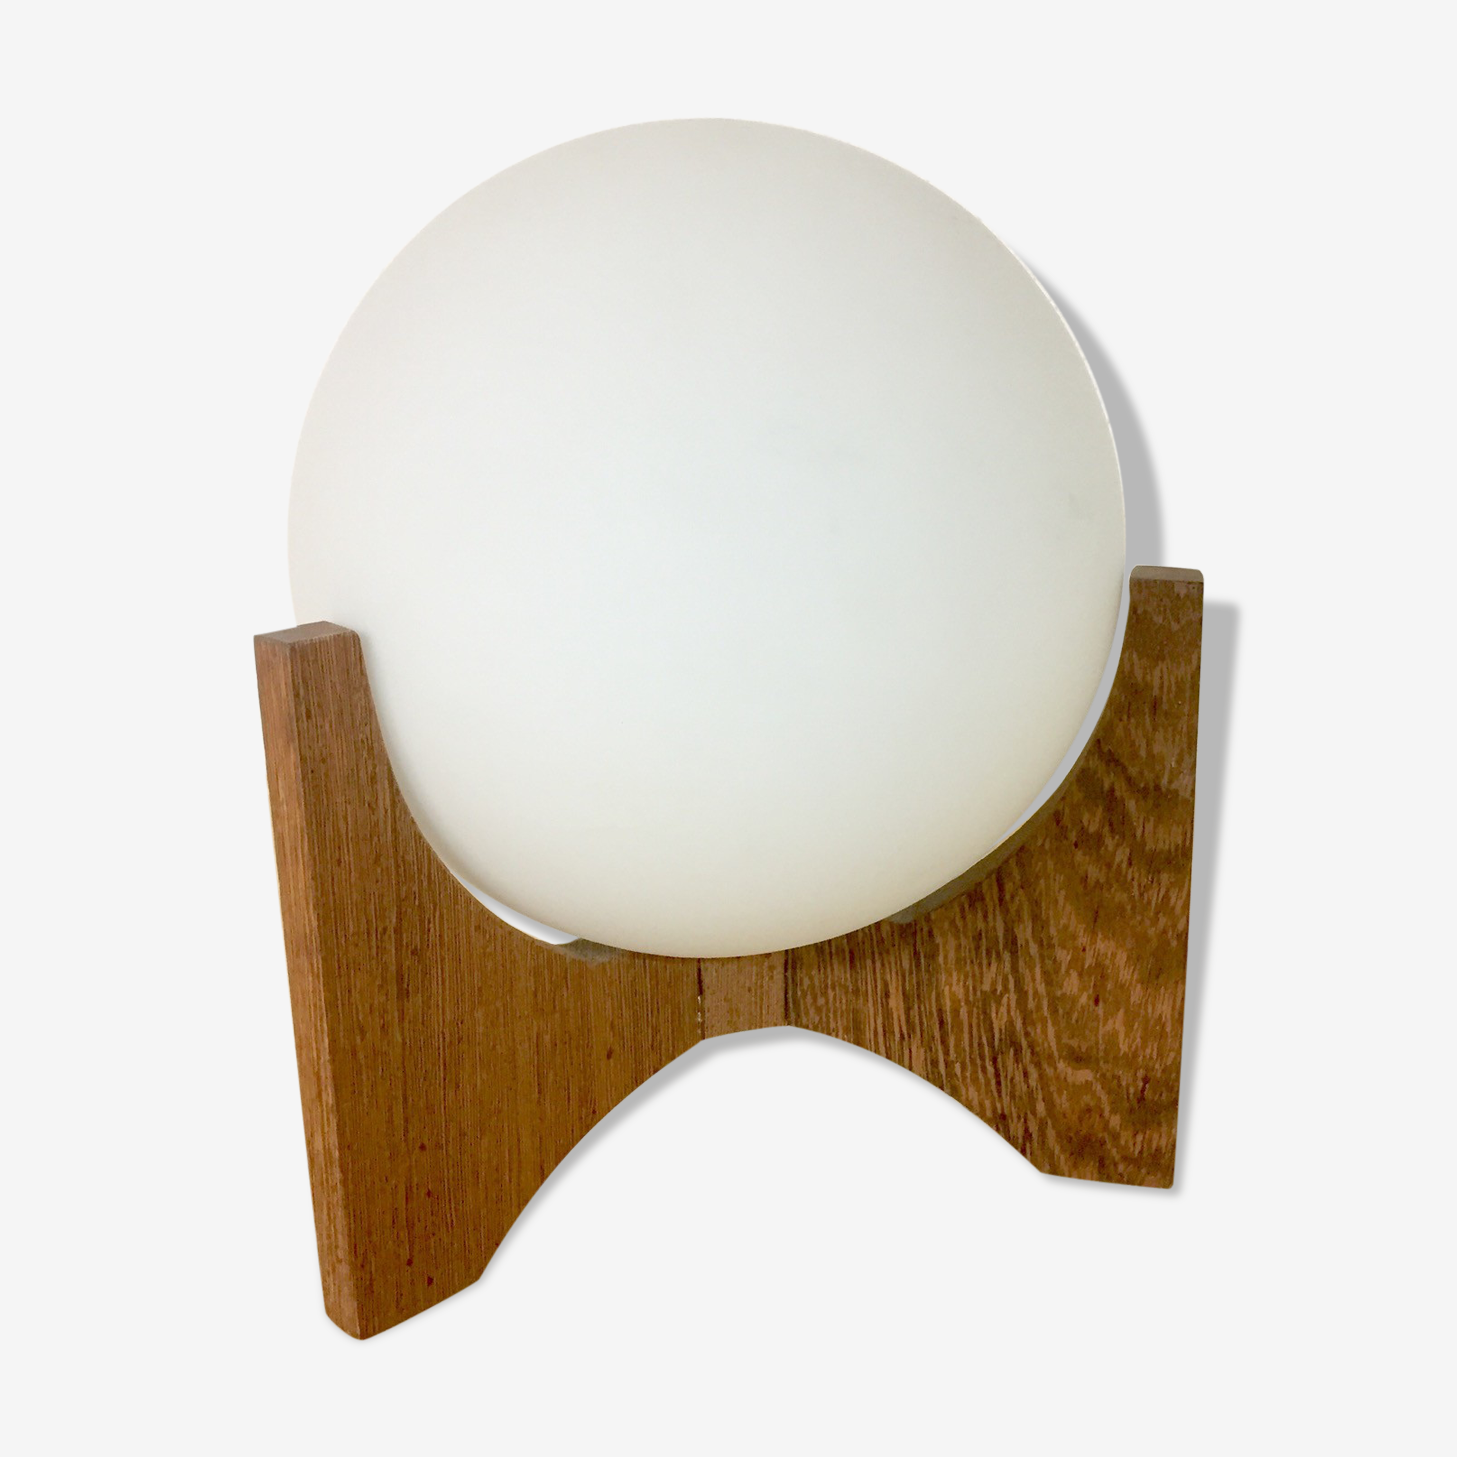 Lampe boule scandinave, 1970